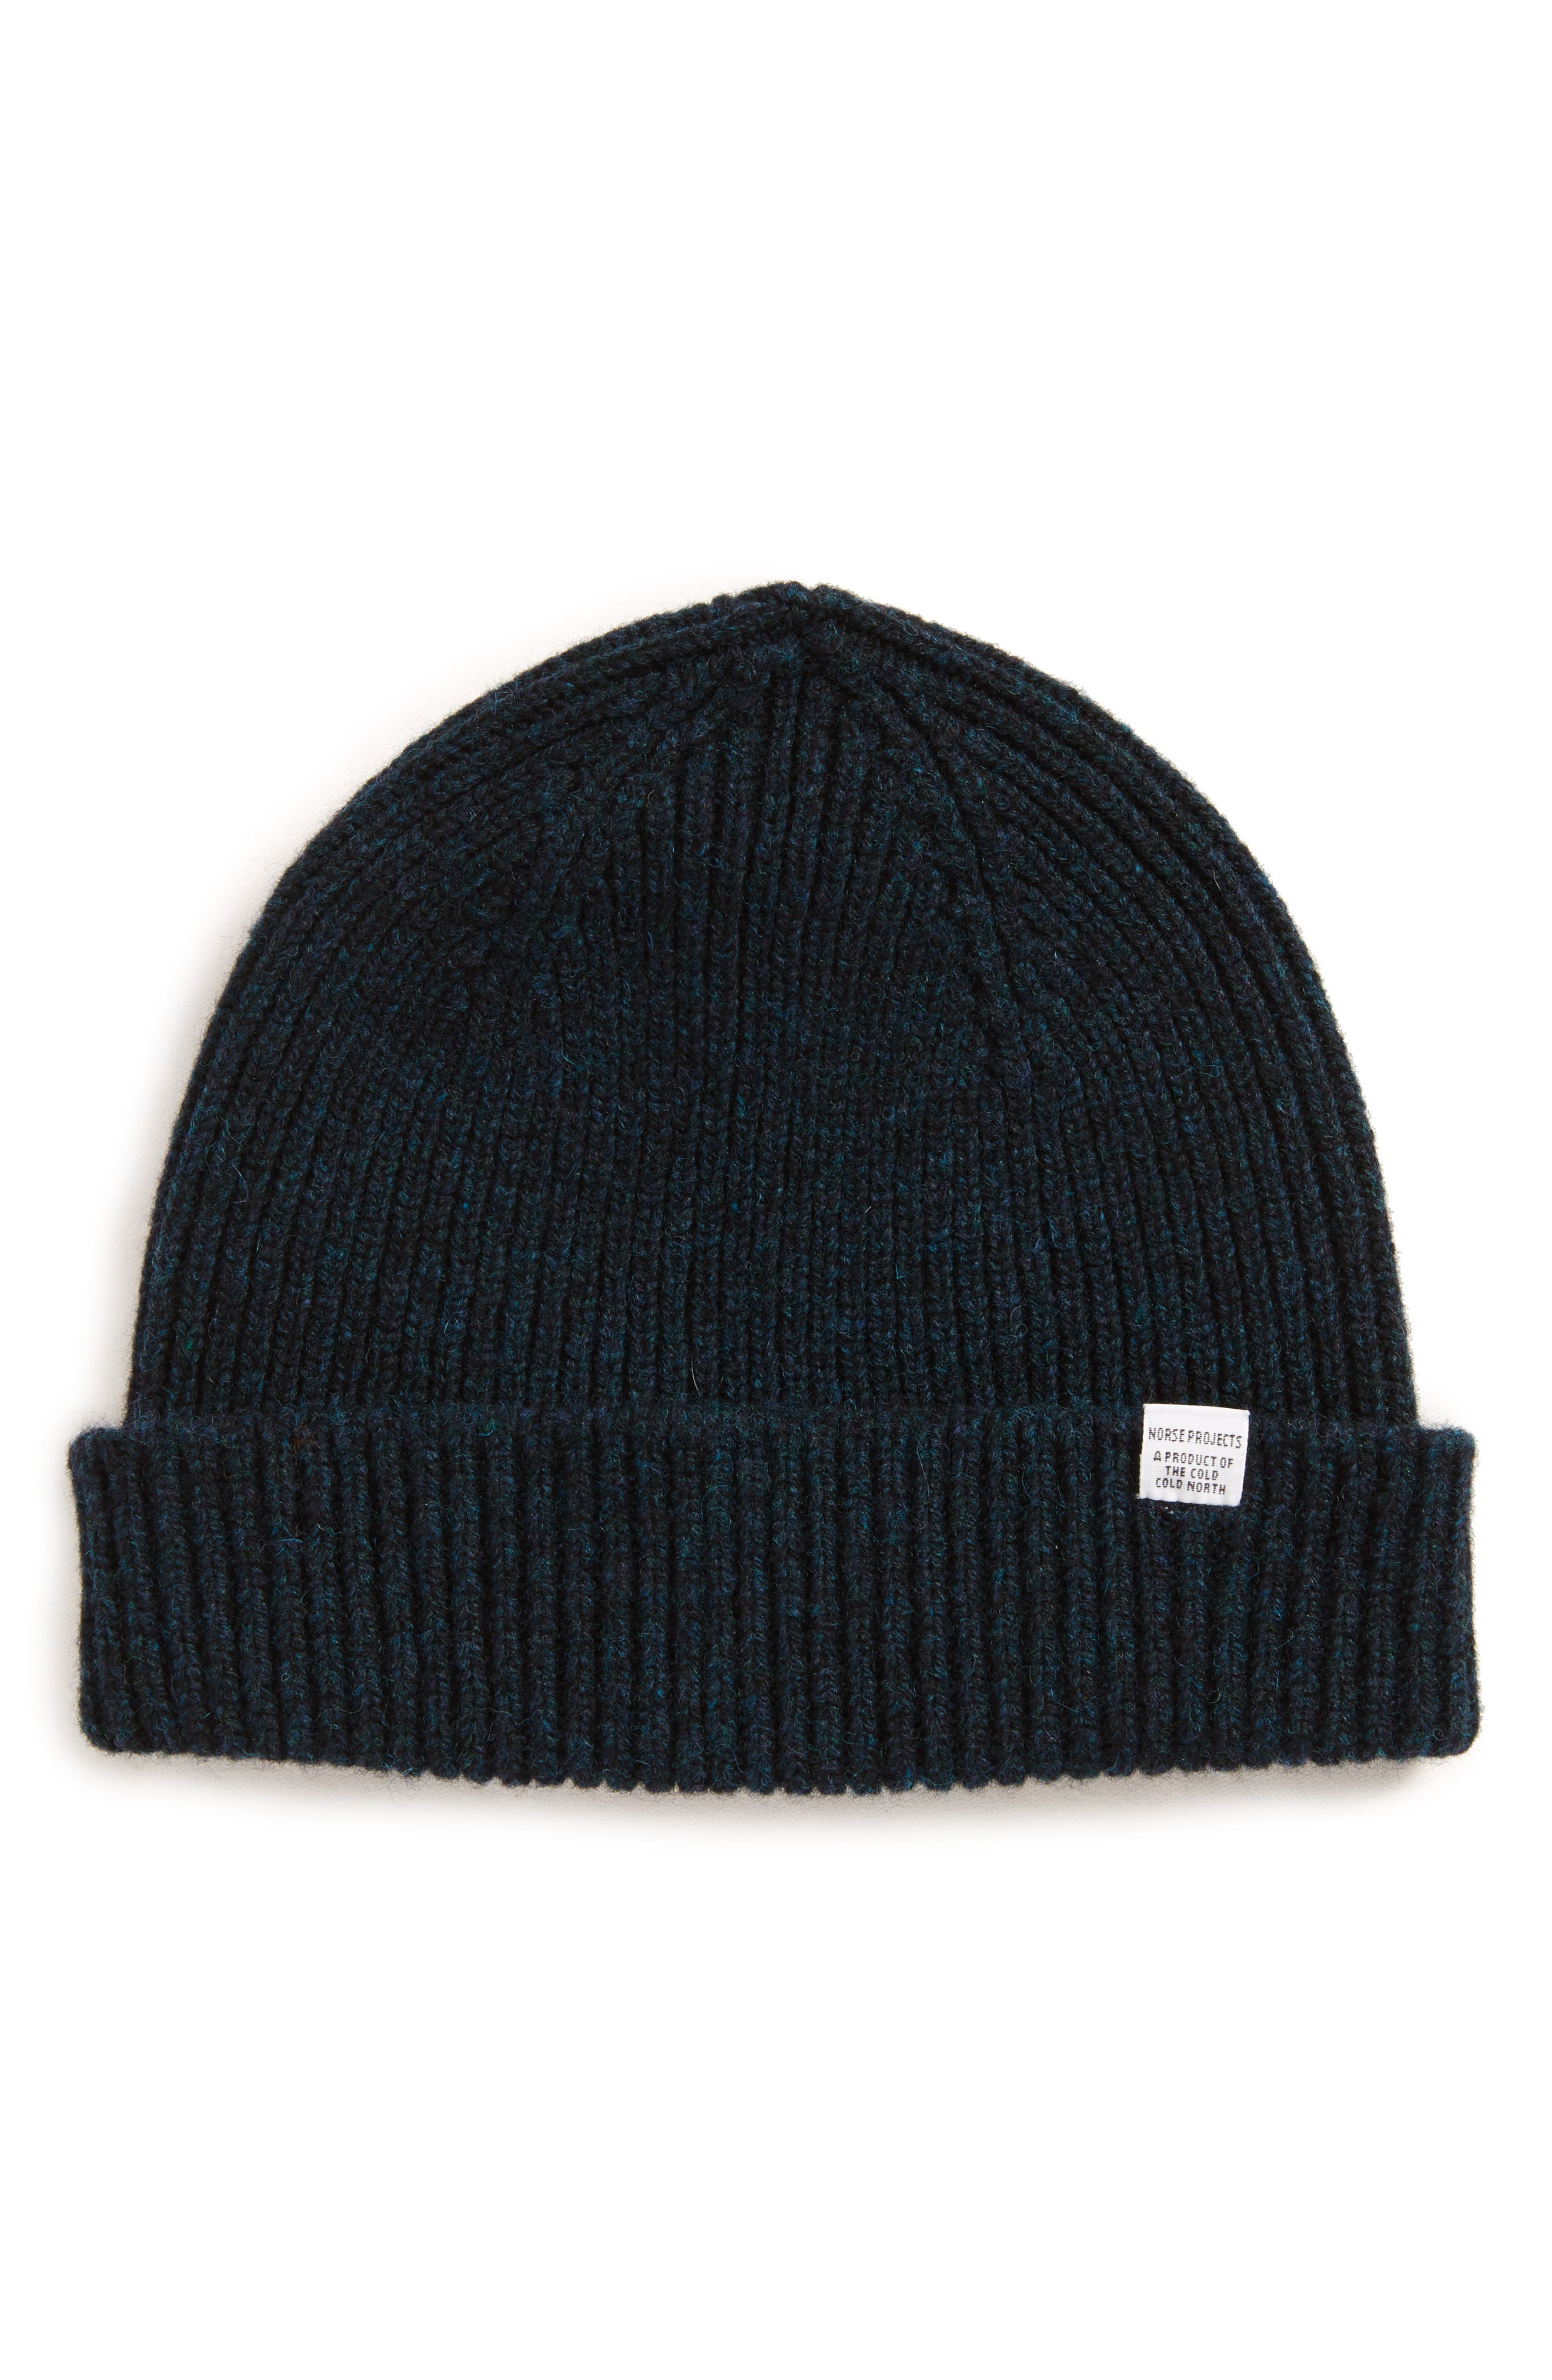 ccac538bc30 shop jordan skully hats youtube f8eec 4c250